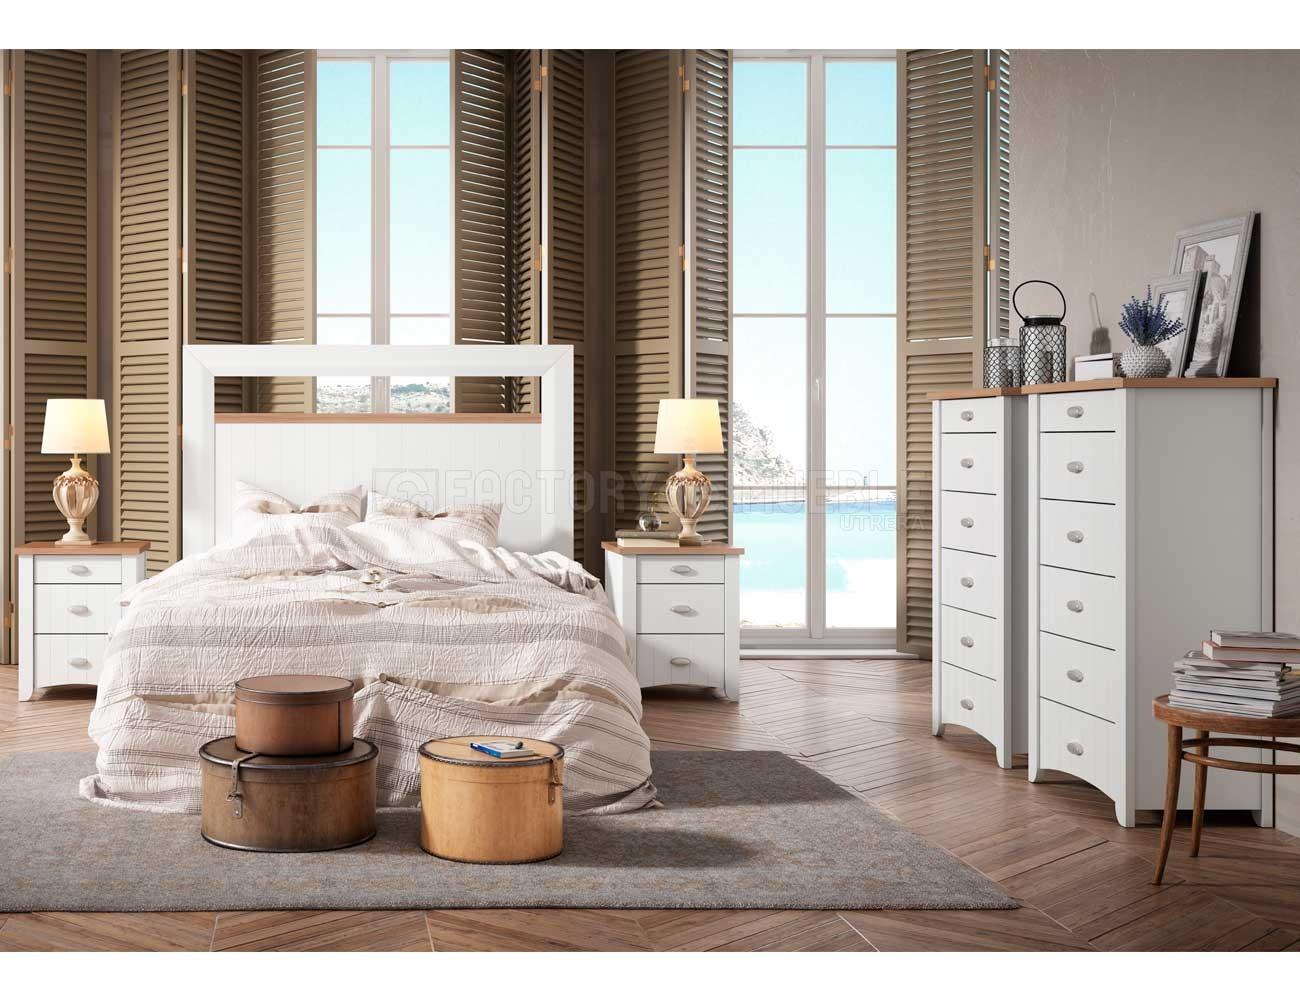 Dormitorio matrimonio rustico blanco 5